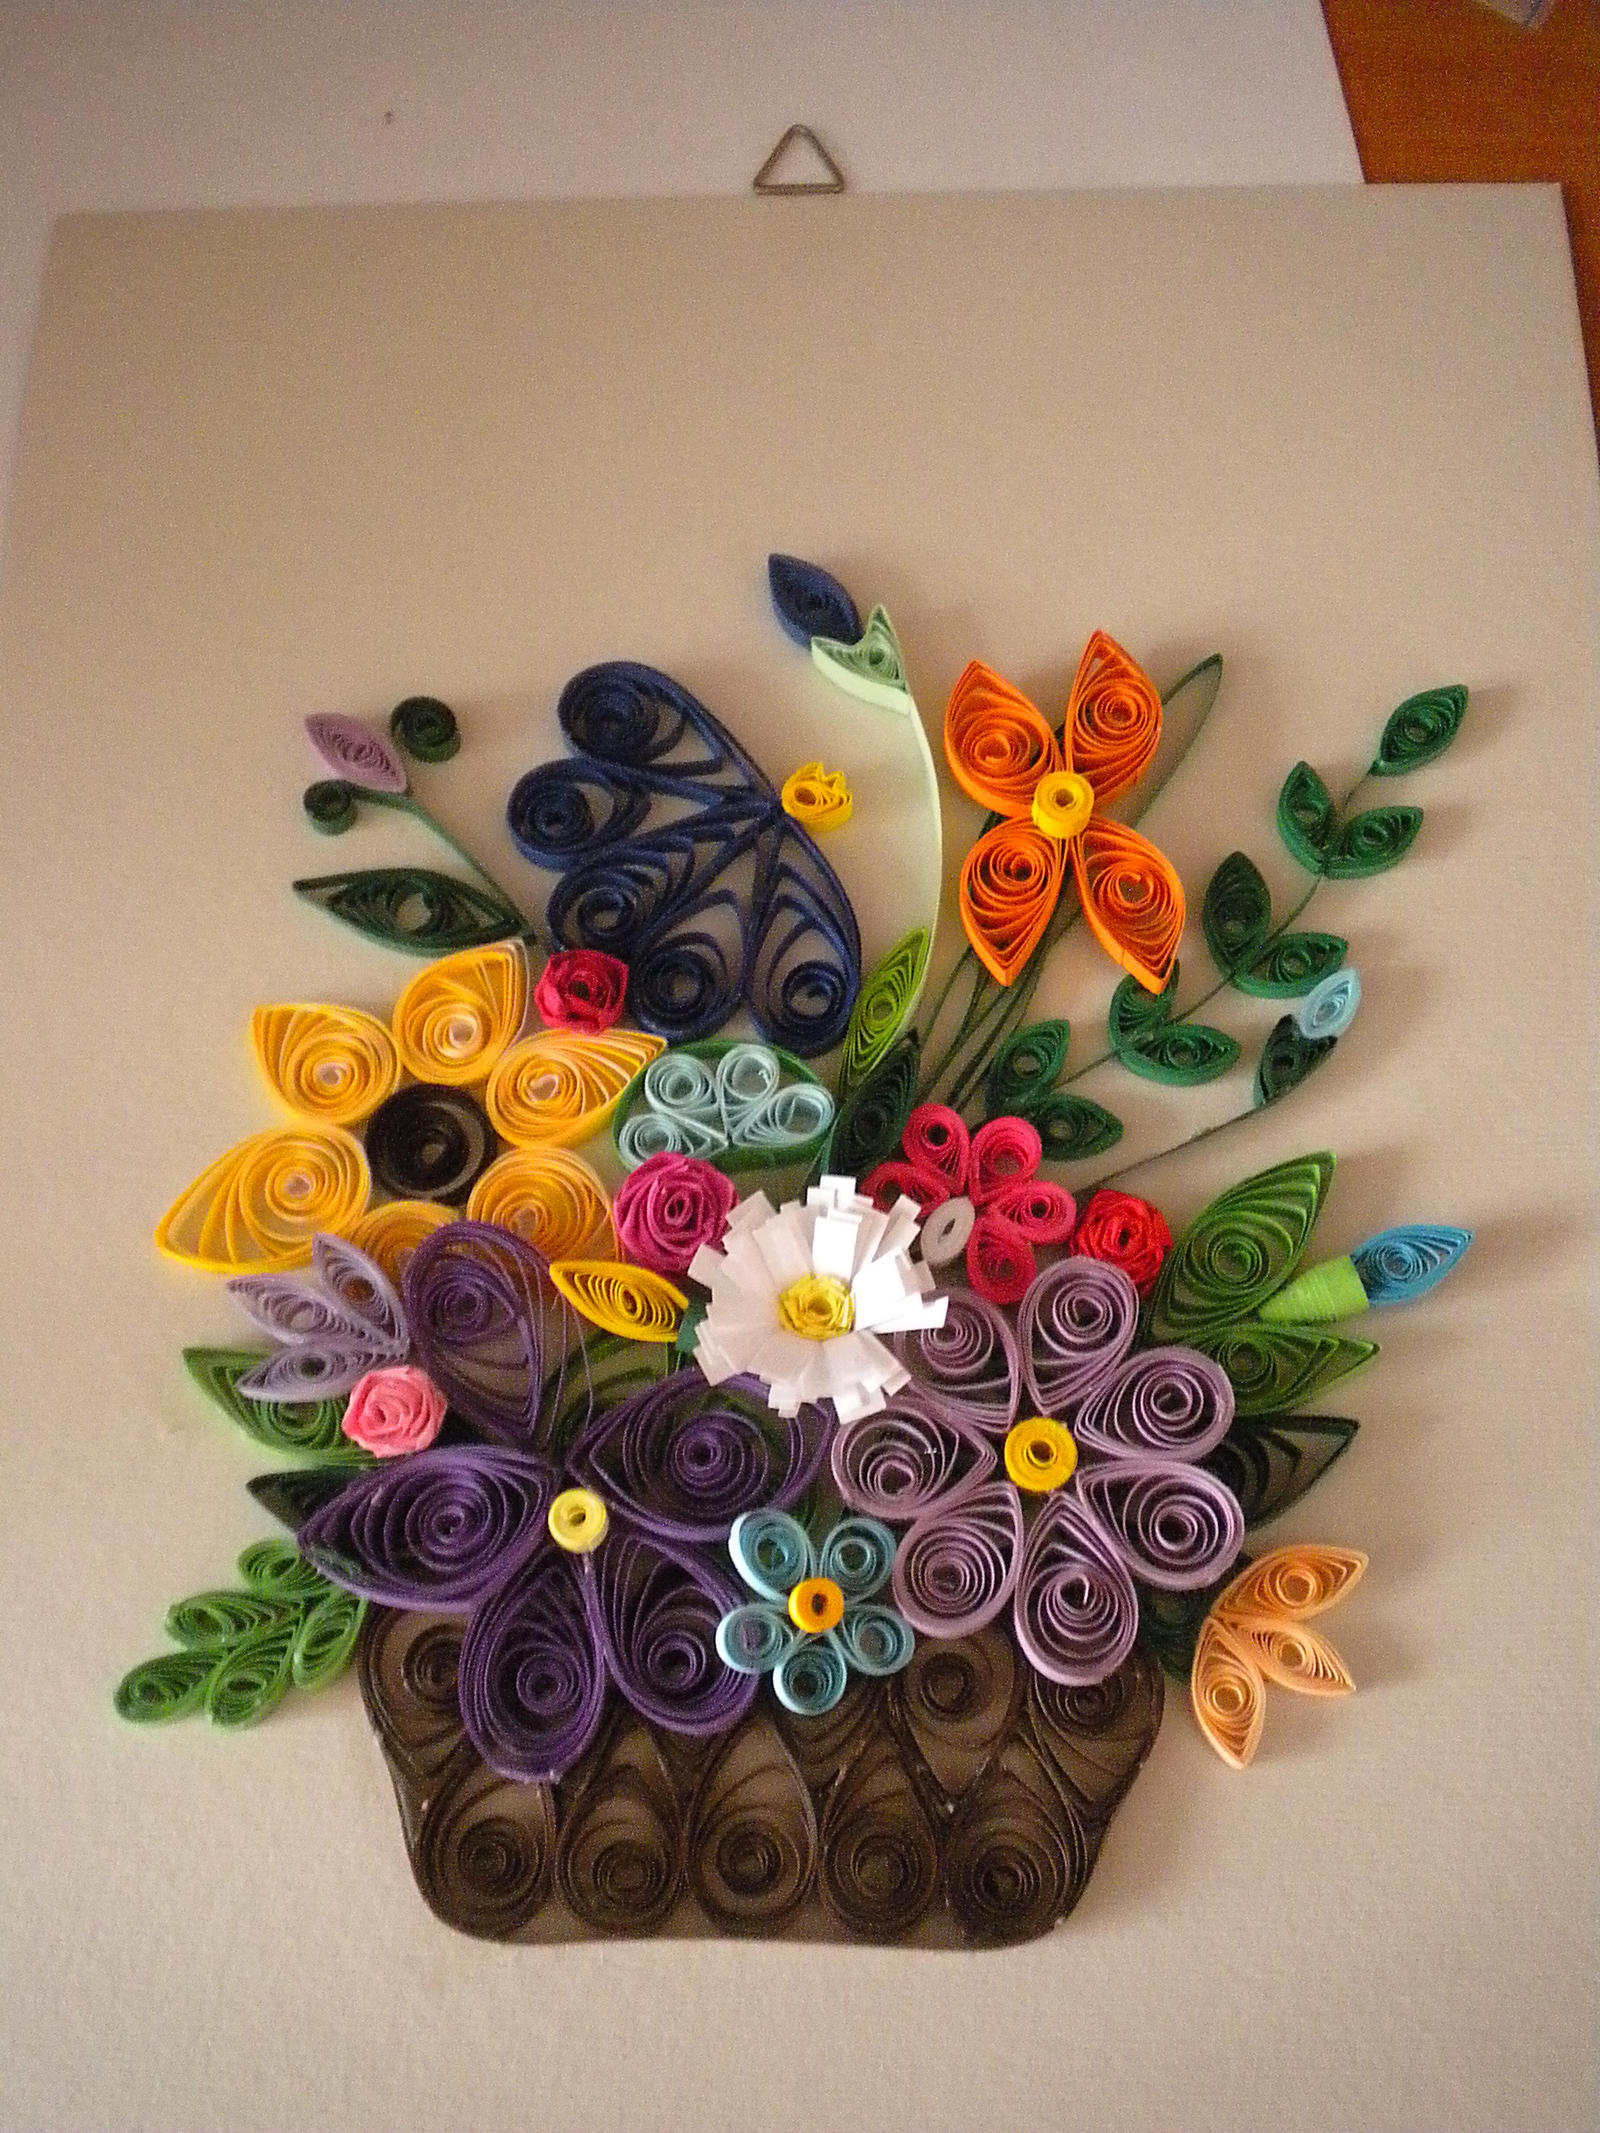 Quilled Floral Arrangement By Yoyothemadscientist On